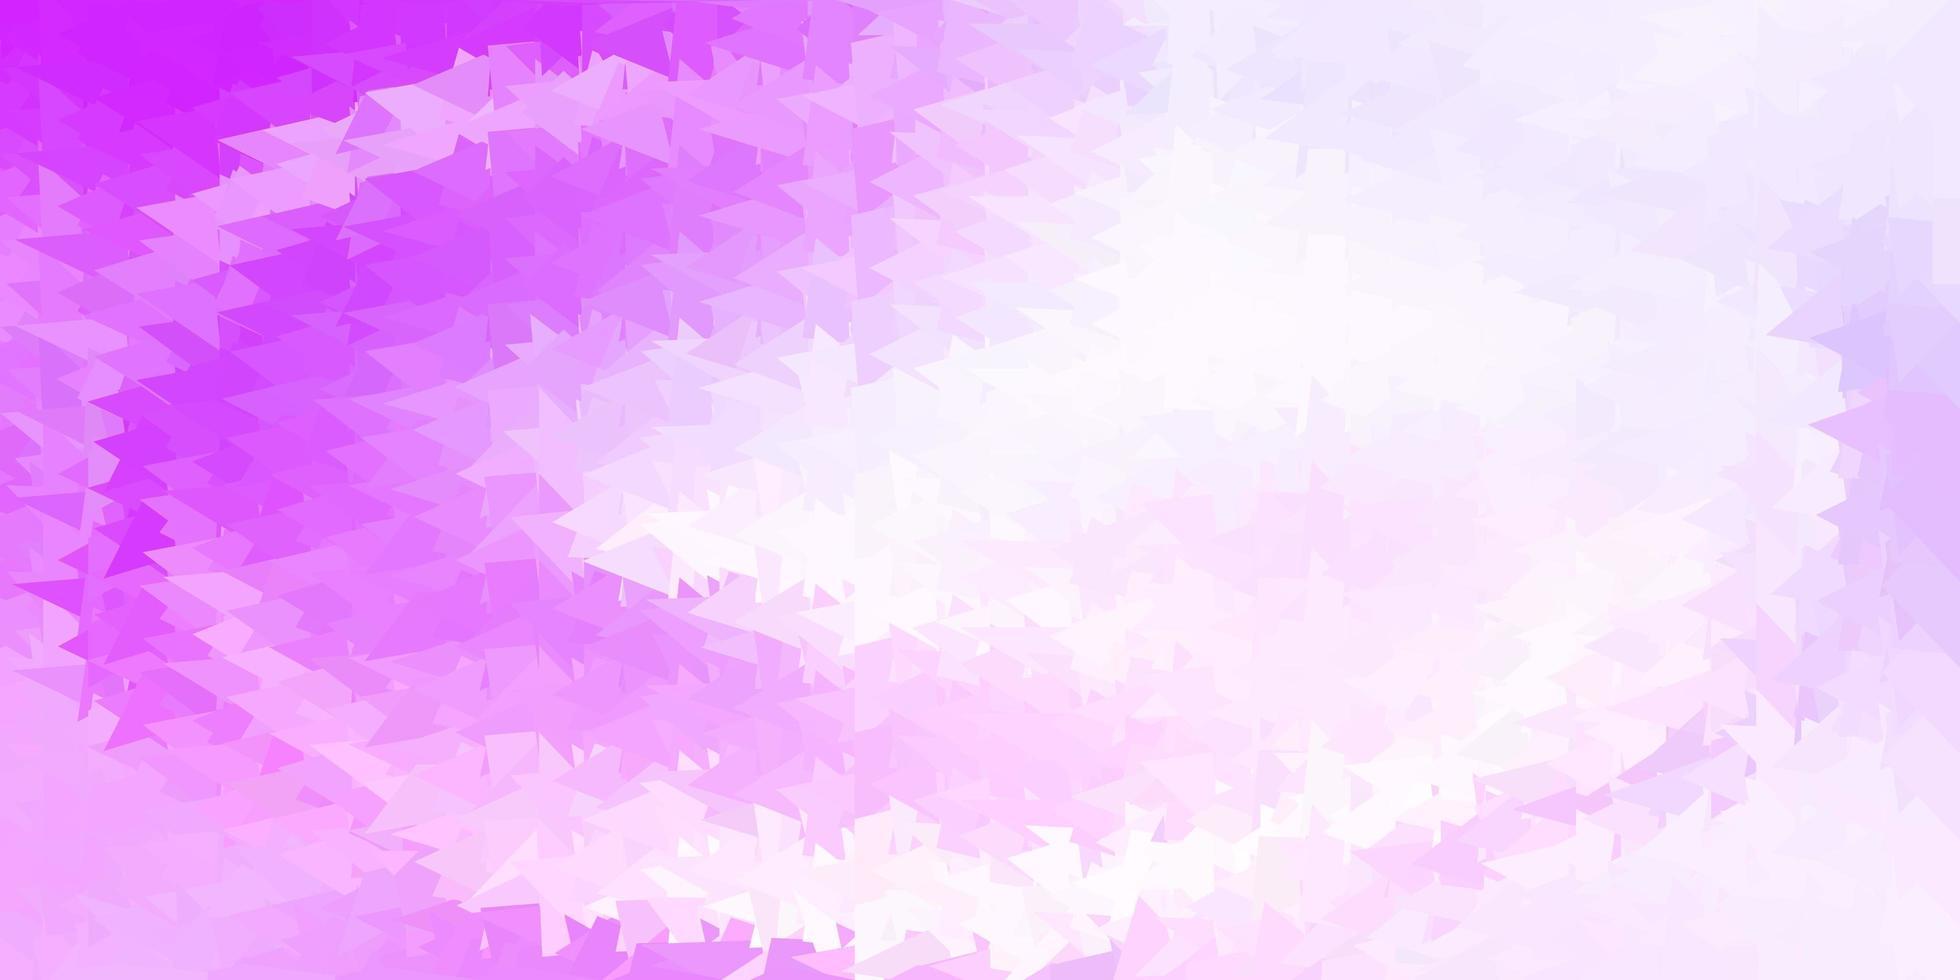 luz roxa padrão poligonal do vetor. vetor